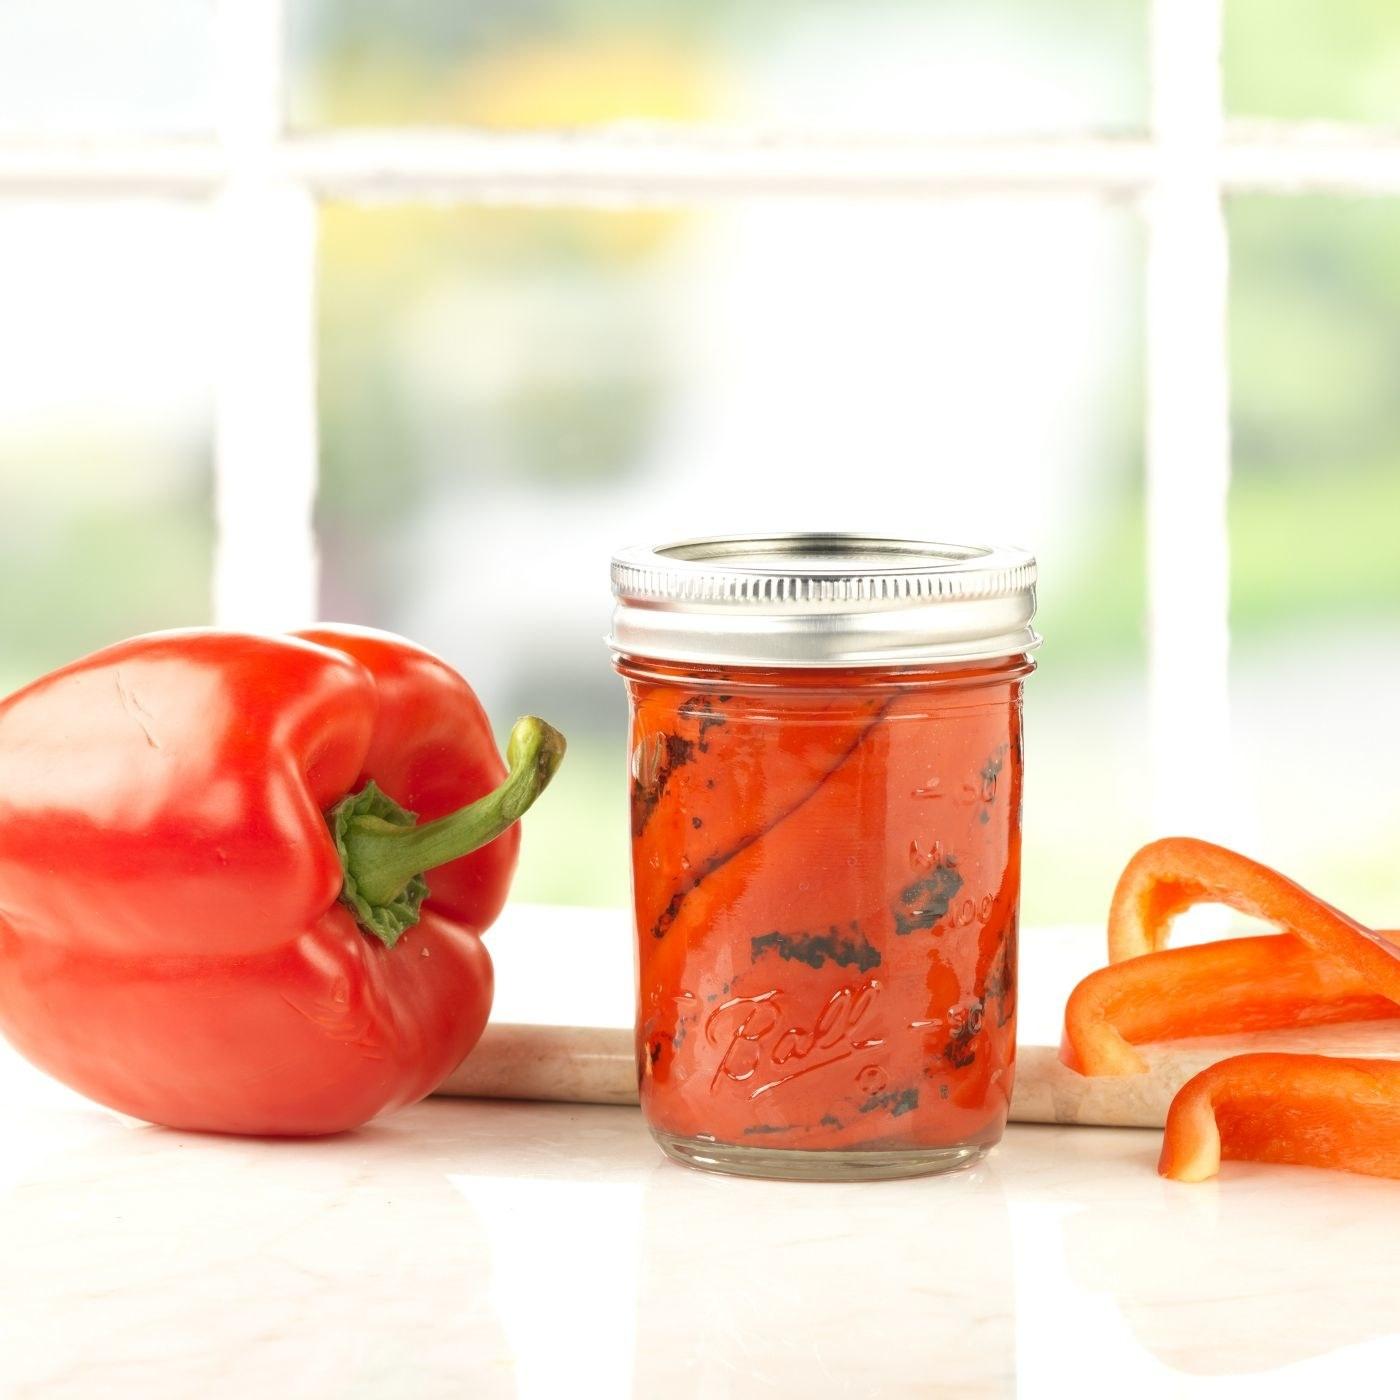 Roasted pepper in a mason jar in a home